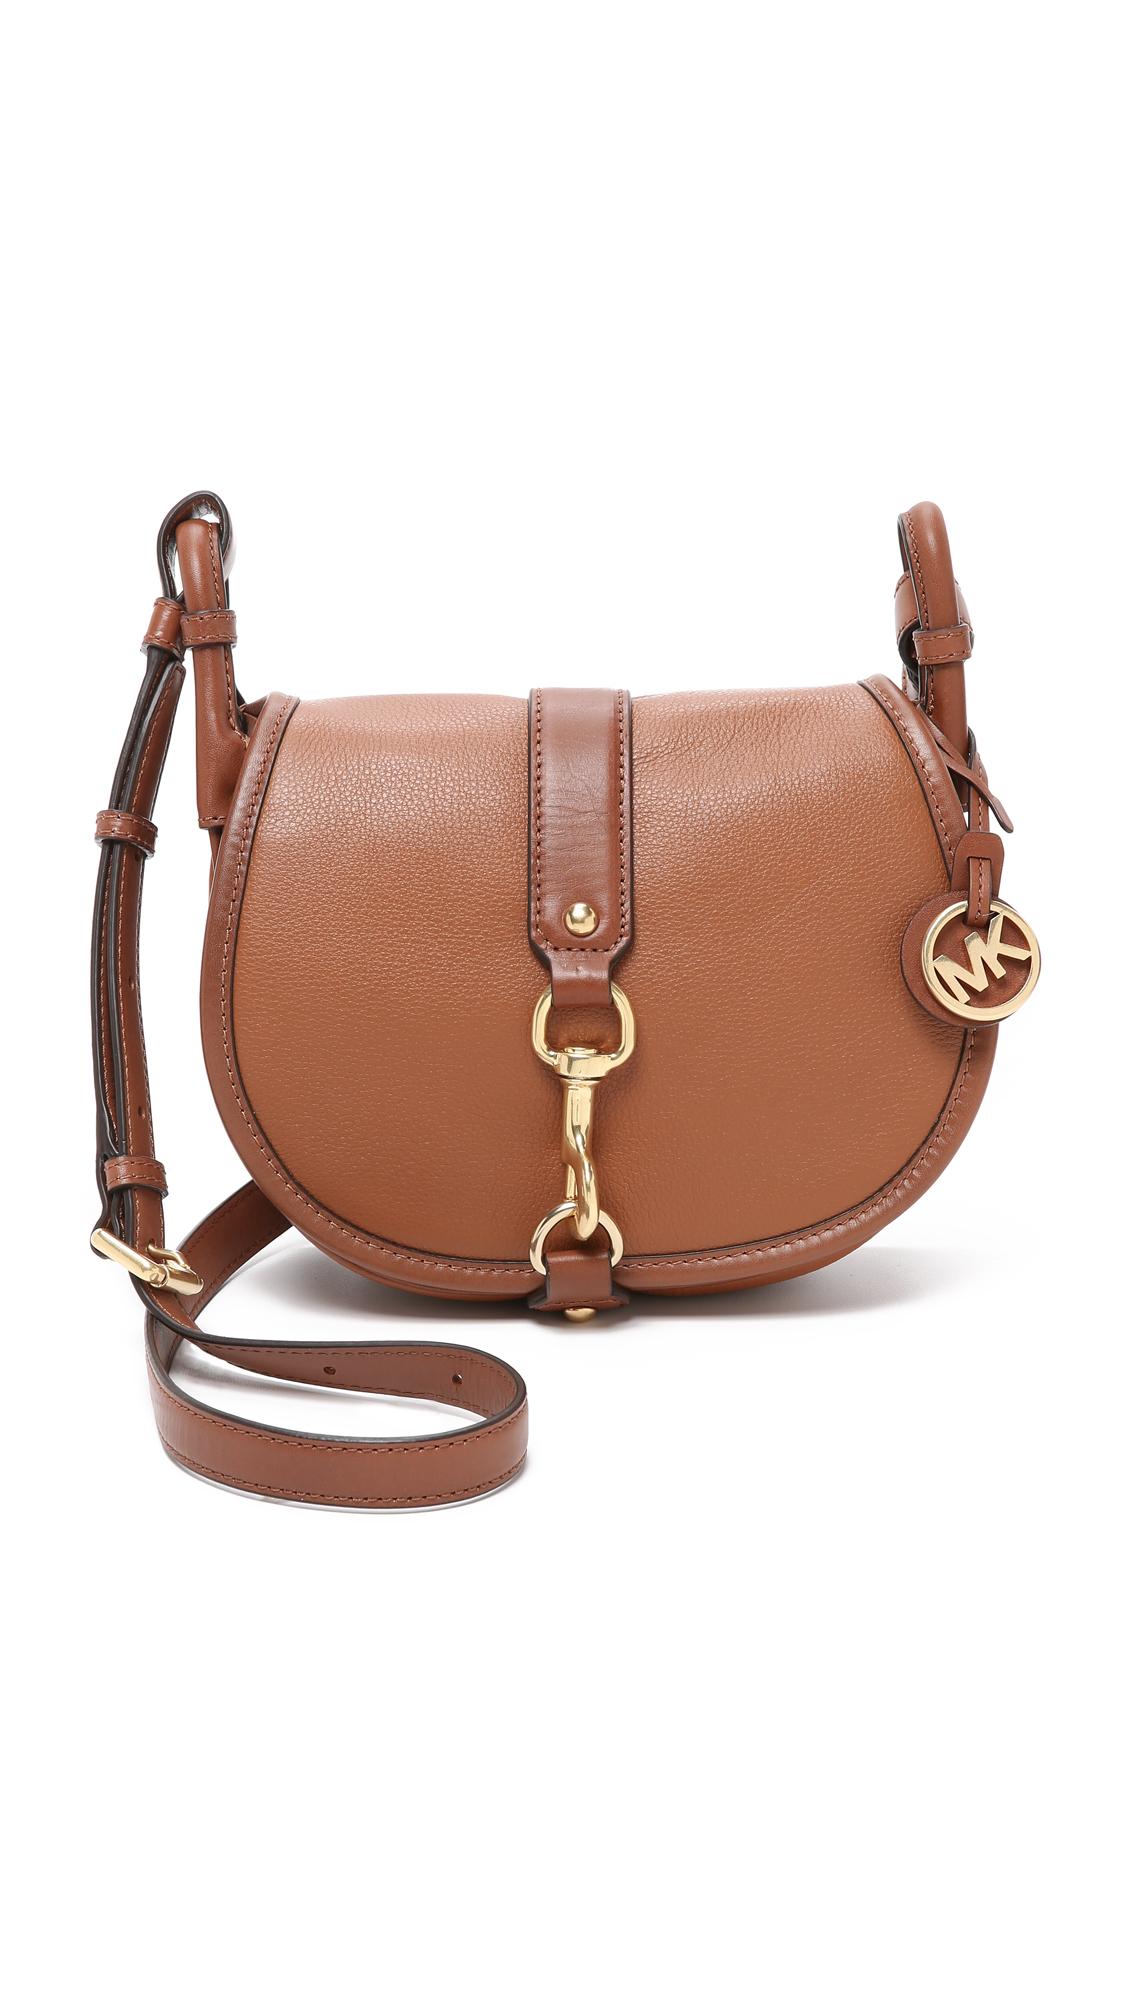 7c9946269e ... czech lyst michael michael kors jamie saddle bag in brown a14d6 79fb5  best price michael kors fulton large leather shoulder ...